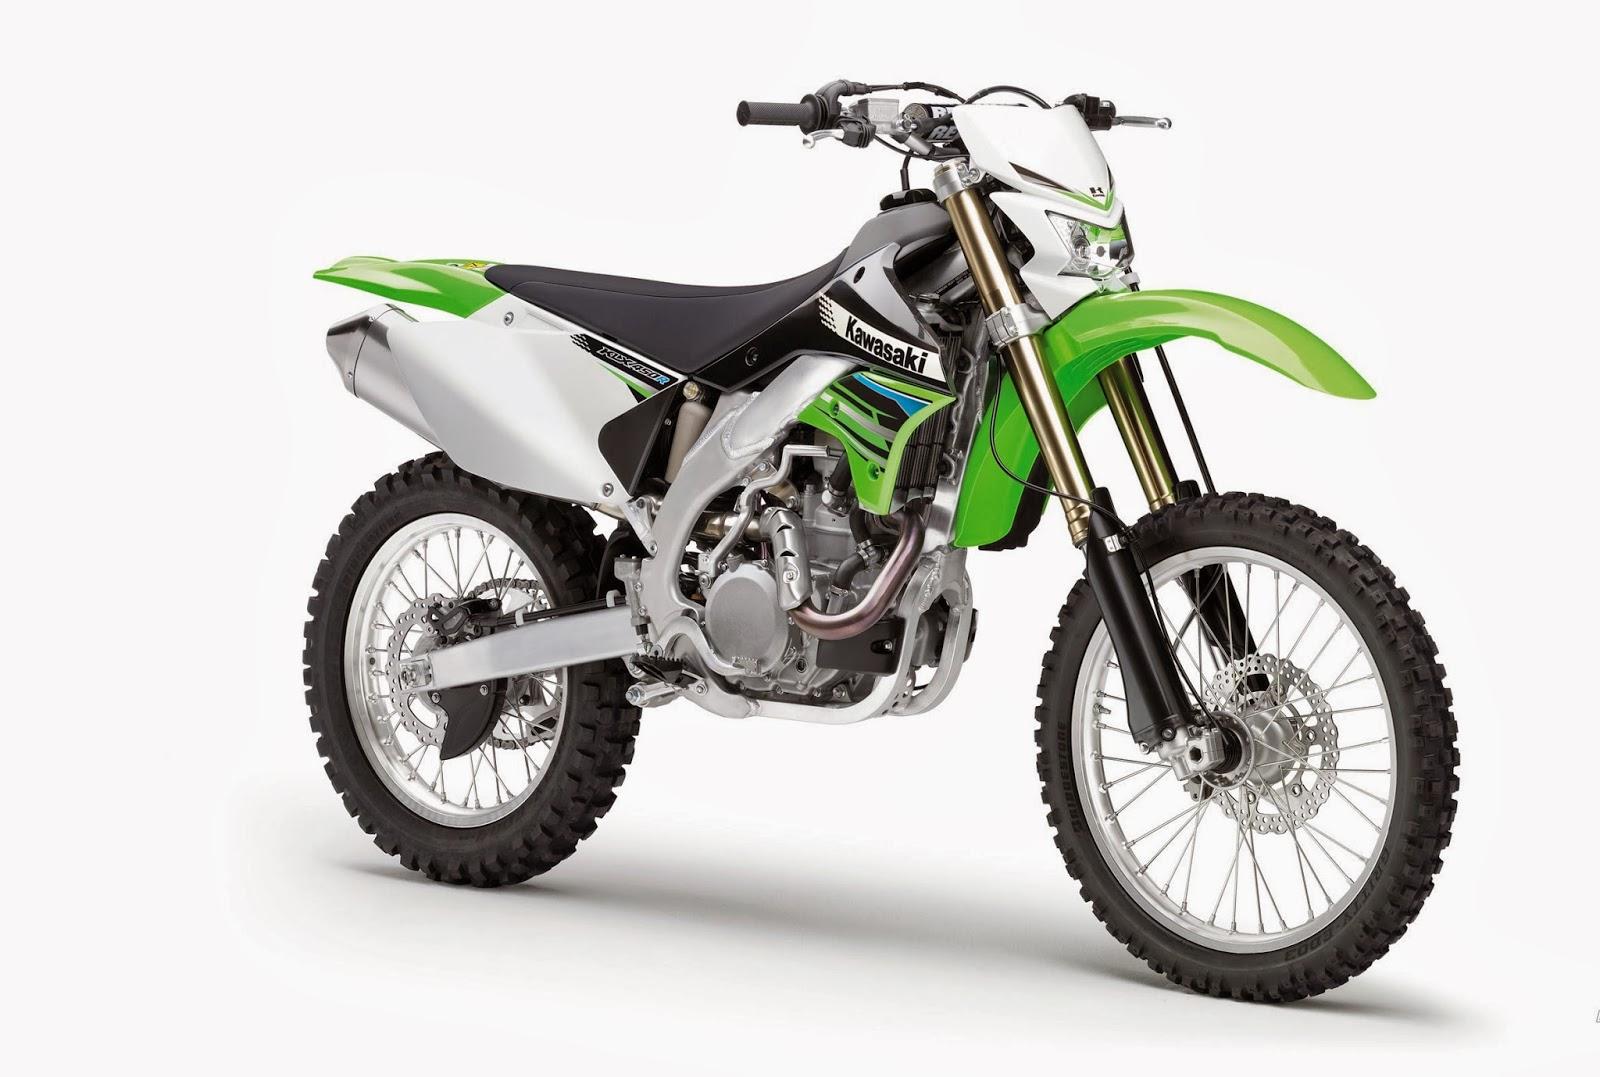 Kawasaki enduro latest x-Bikes